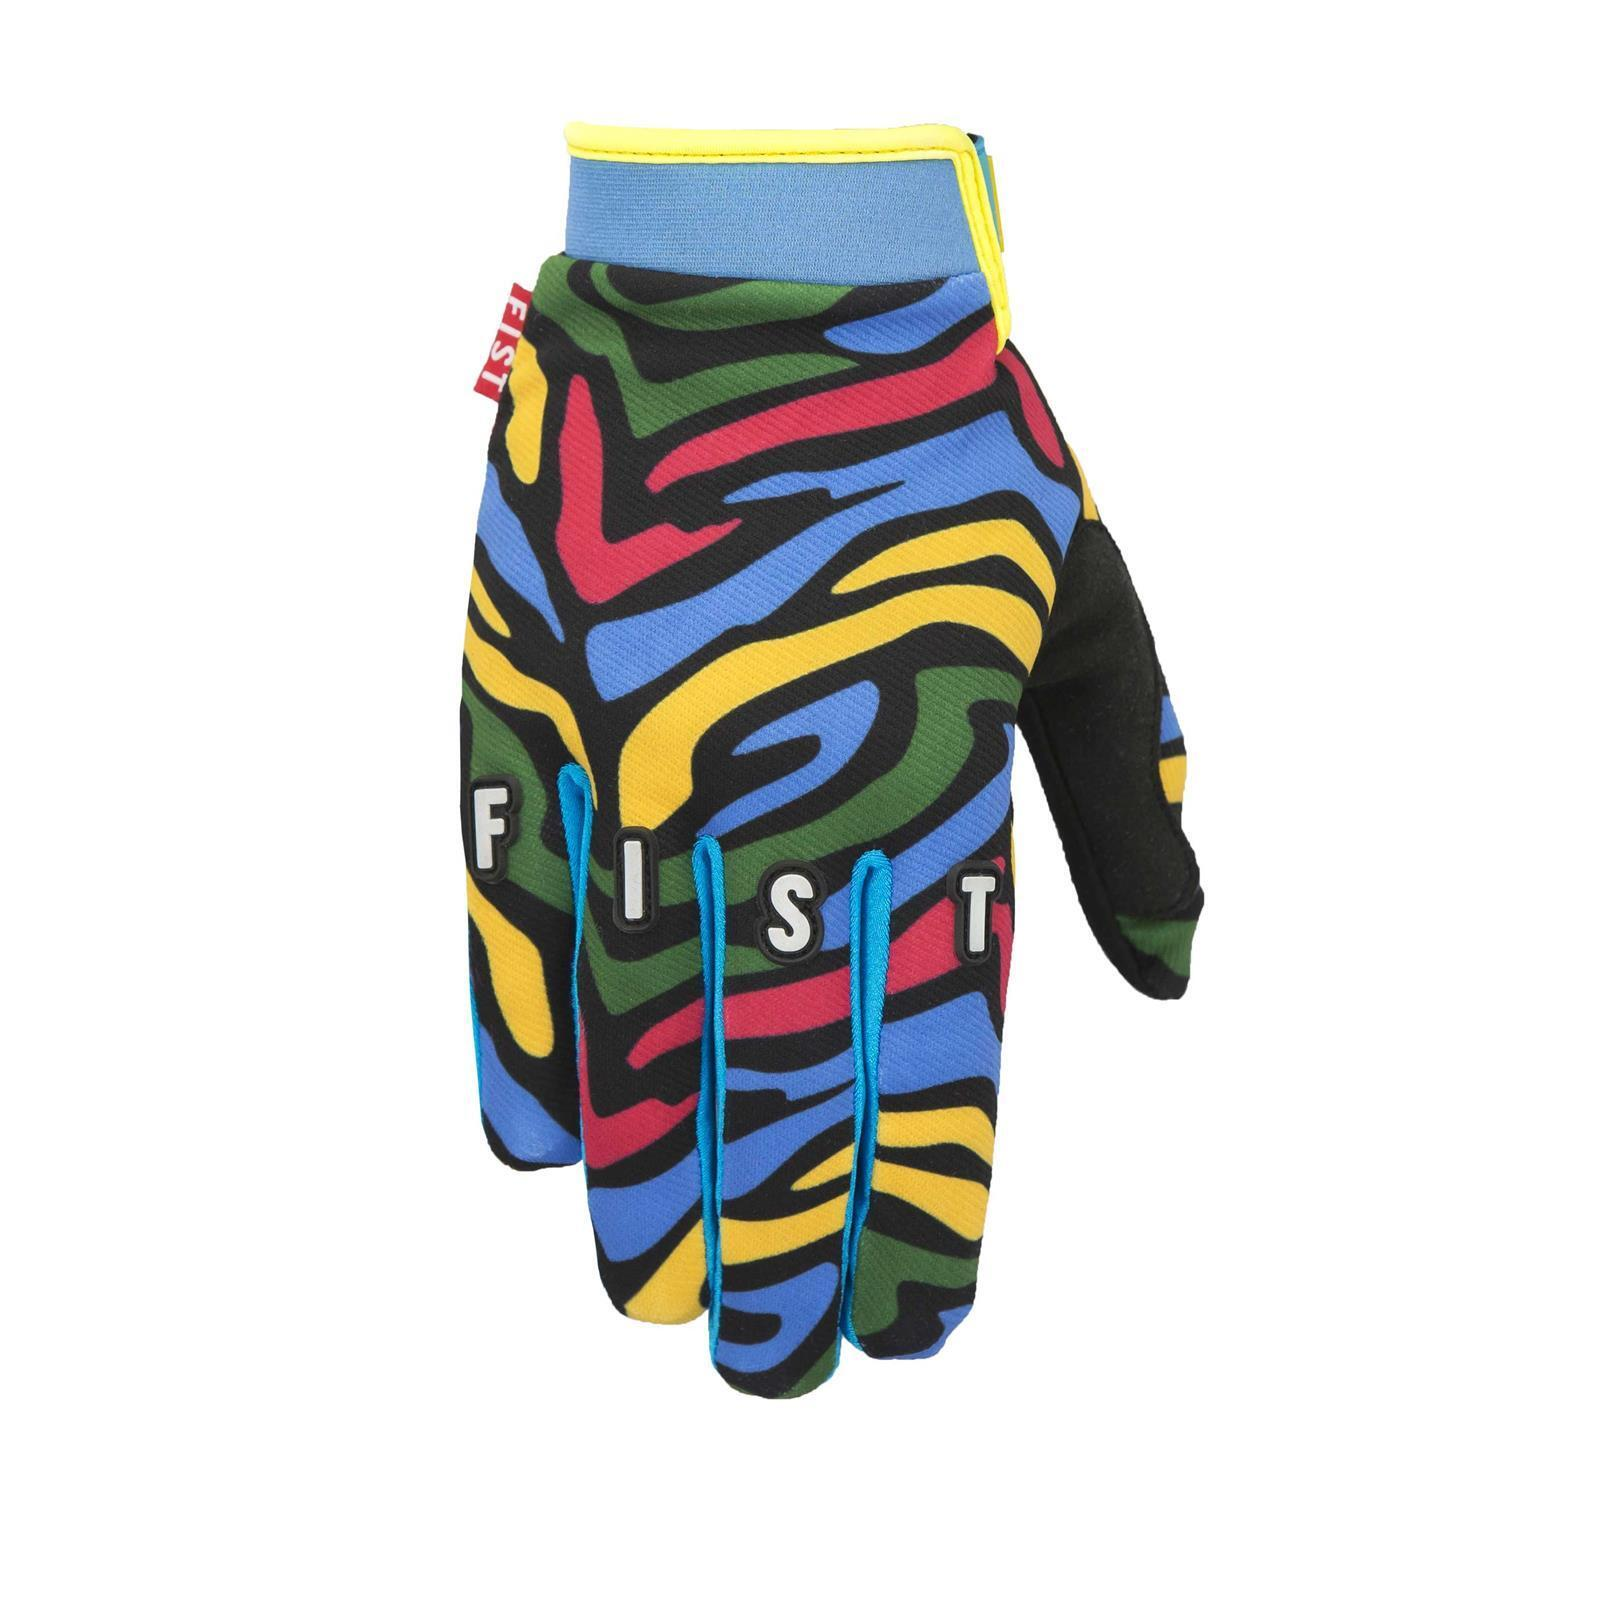 Fist Handwear BMX/MTB Grant Langston ZULU WARRIOR Nero Guanti Nero WARRIOR 5a97e1